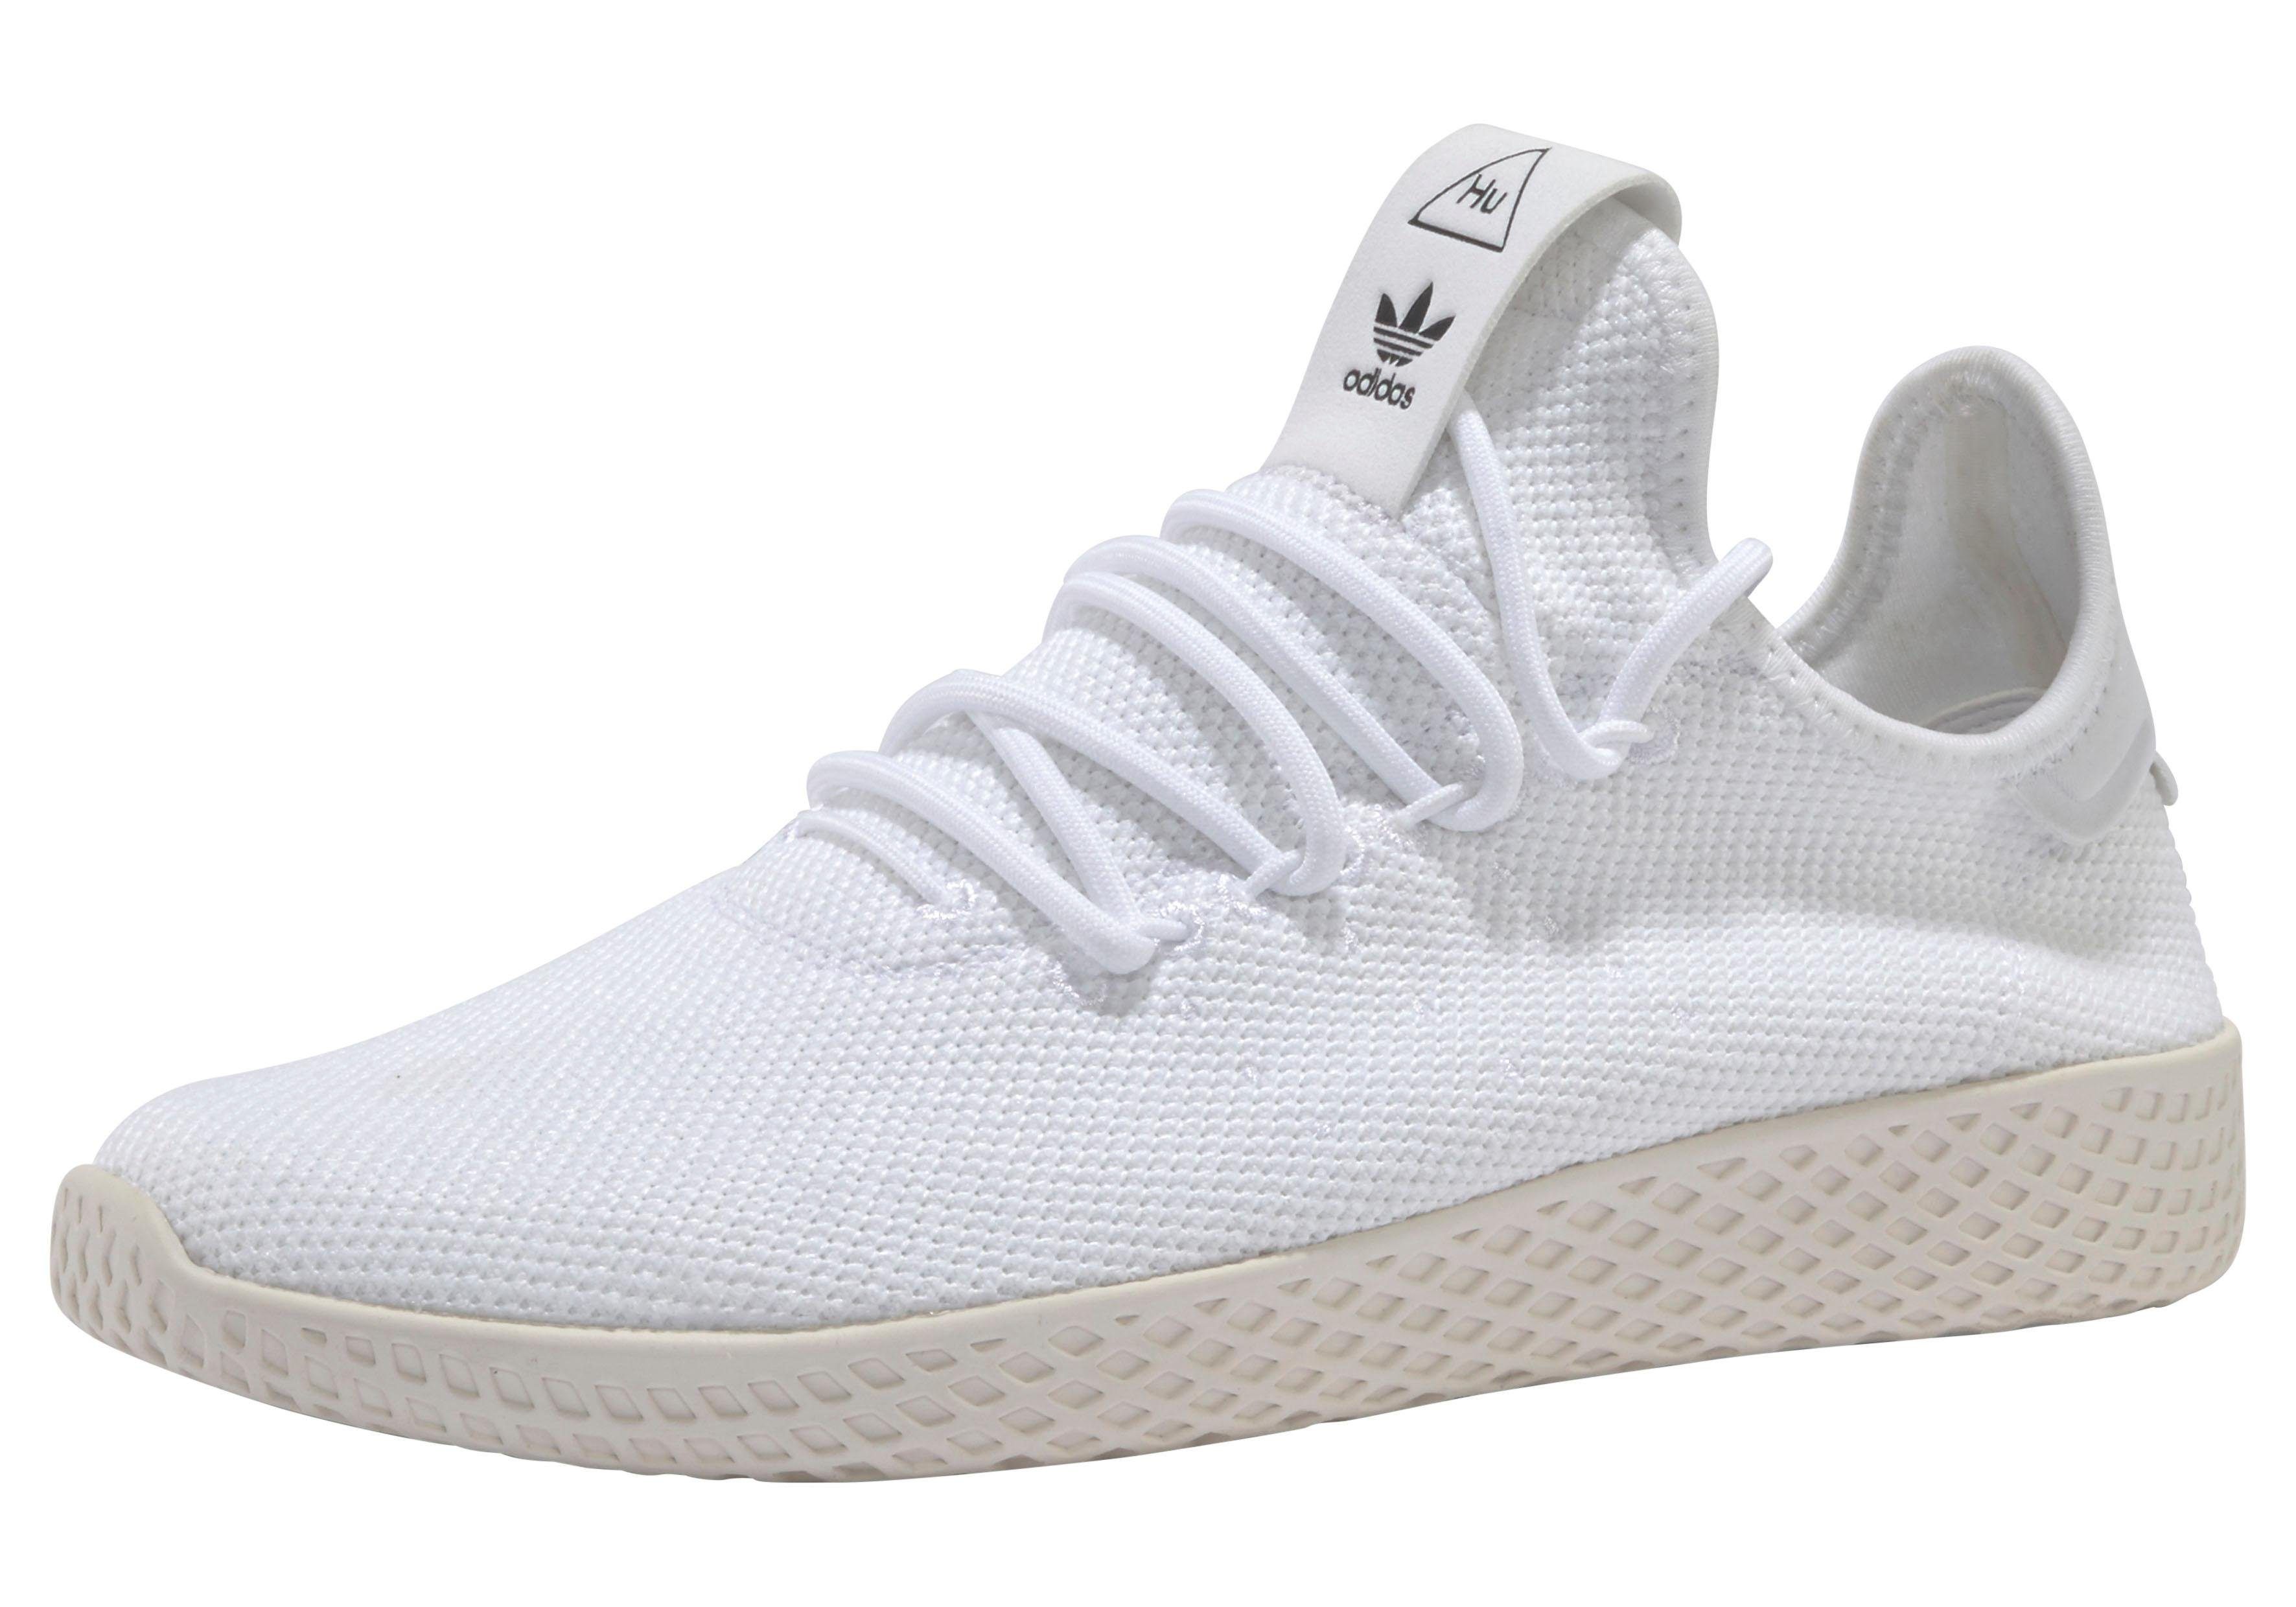 adidas Originals »Pharrel Williams HU Tennis« Sneaker online kaufen | OTTO